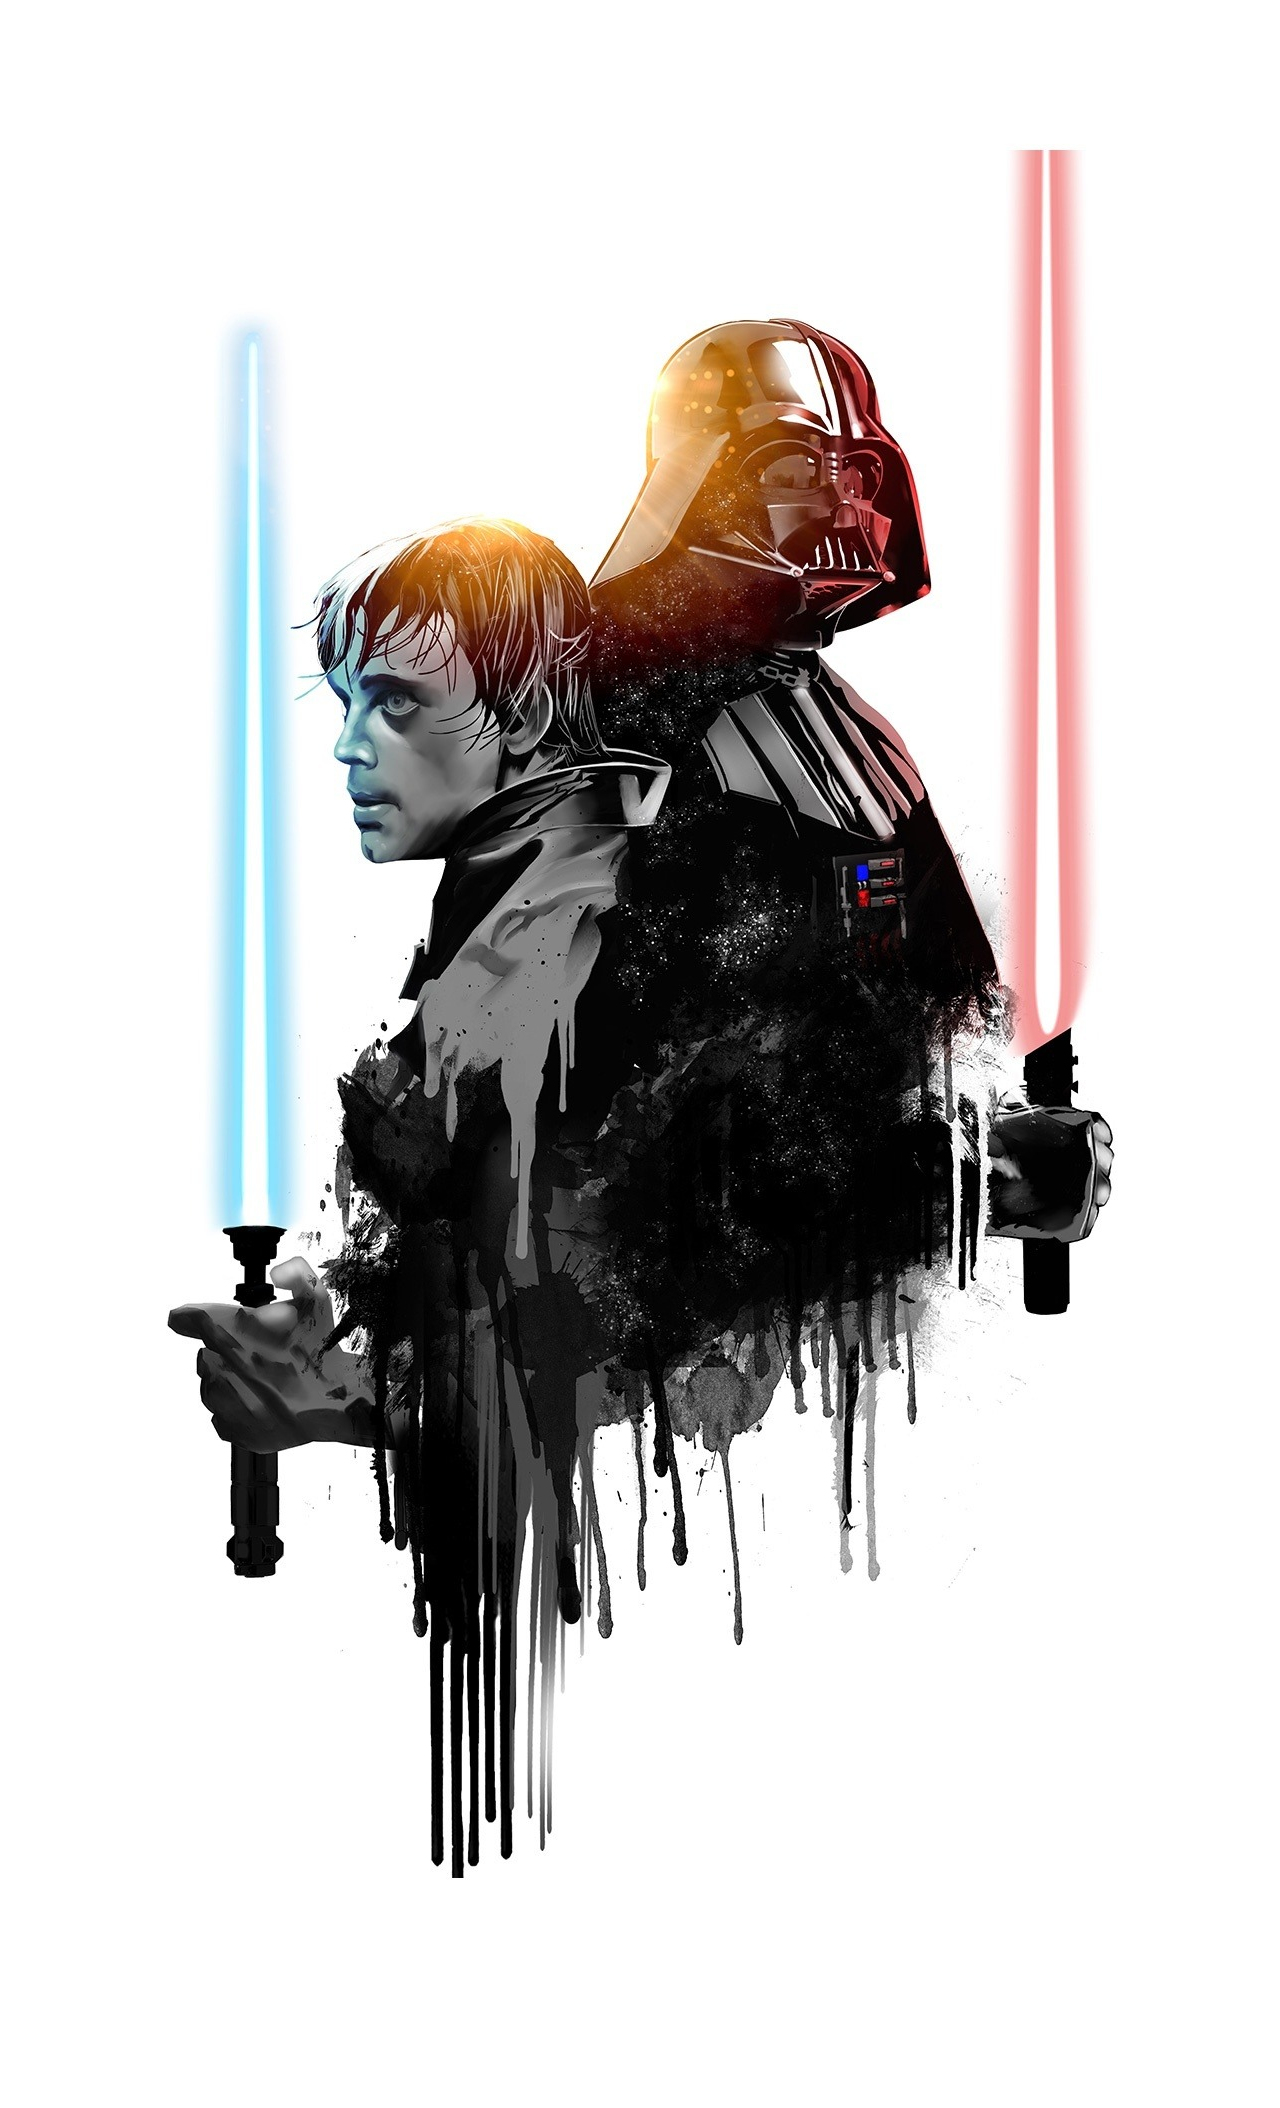 Download 1280x2120 Wallpaper Darth Vader Luke Skywalker Star